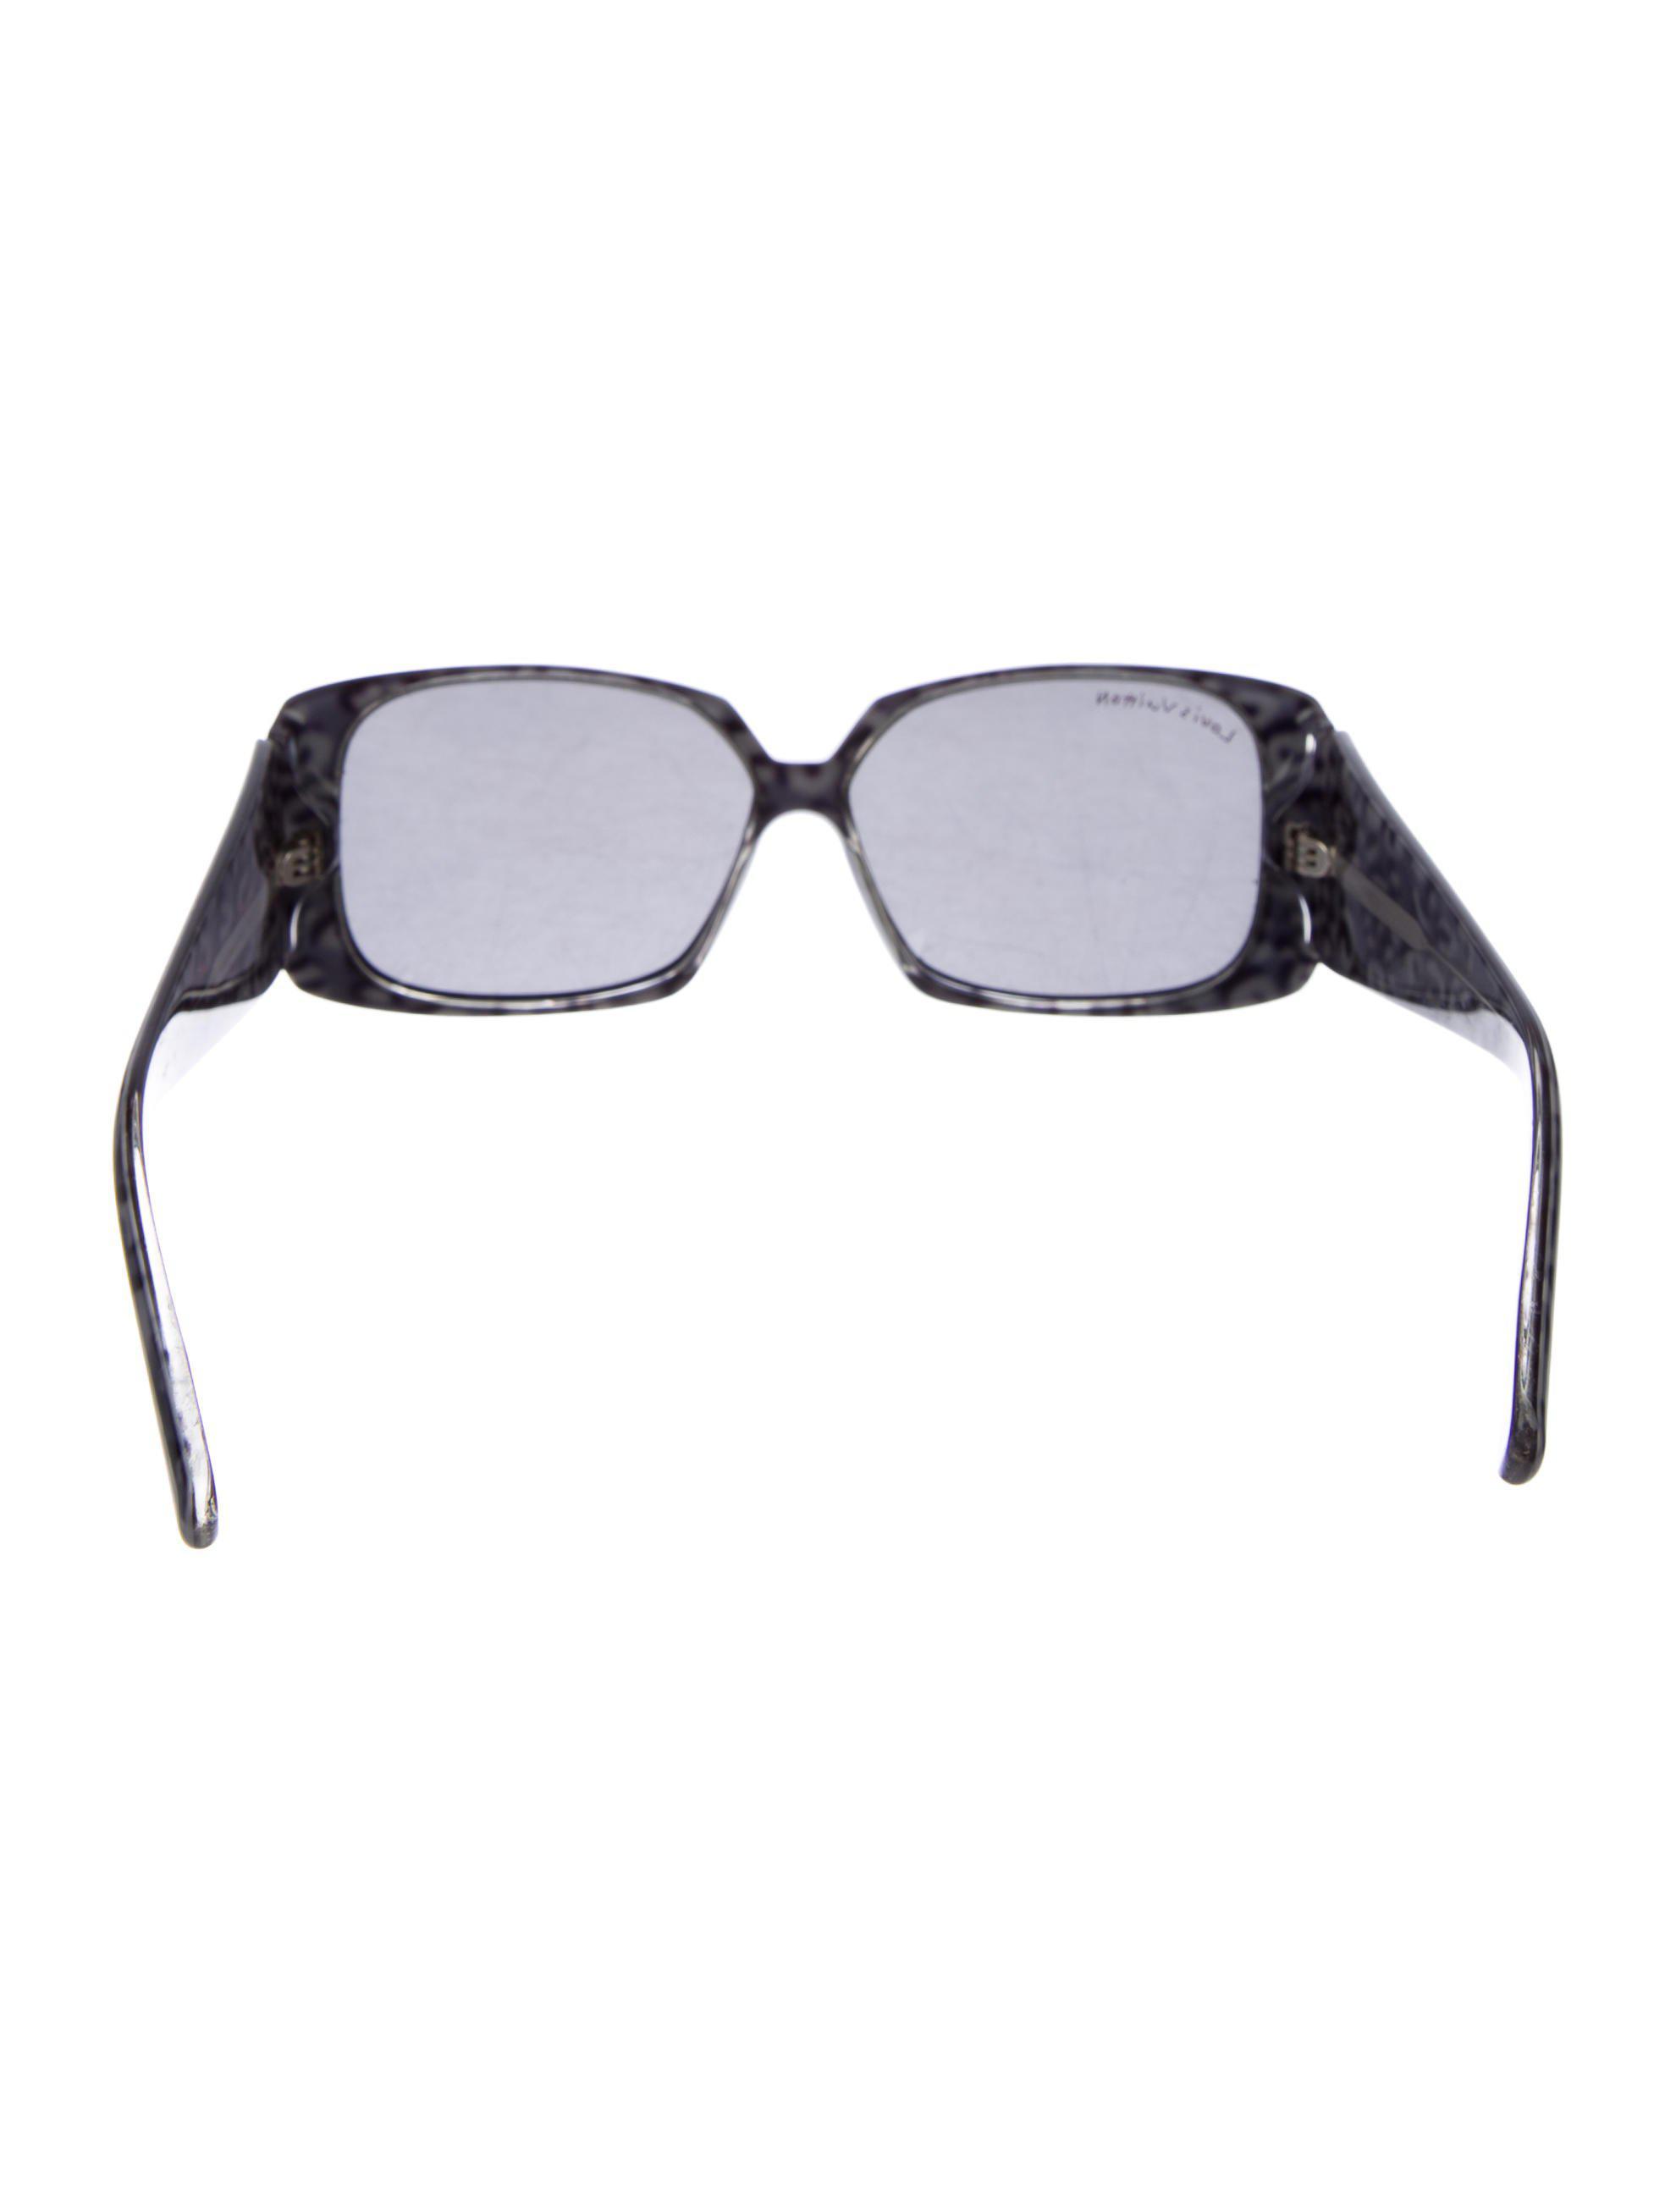 404a1b6f11 Louis Vuitton Butterfly Sunglasses Leopard « One More Soul